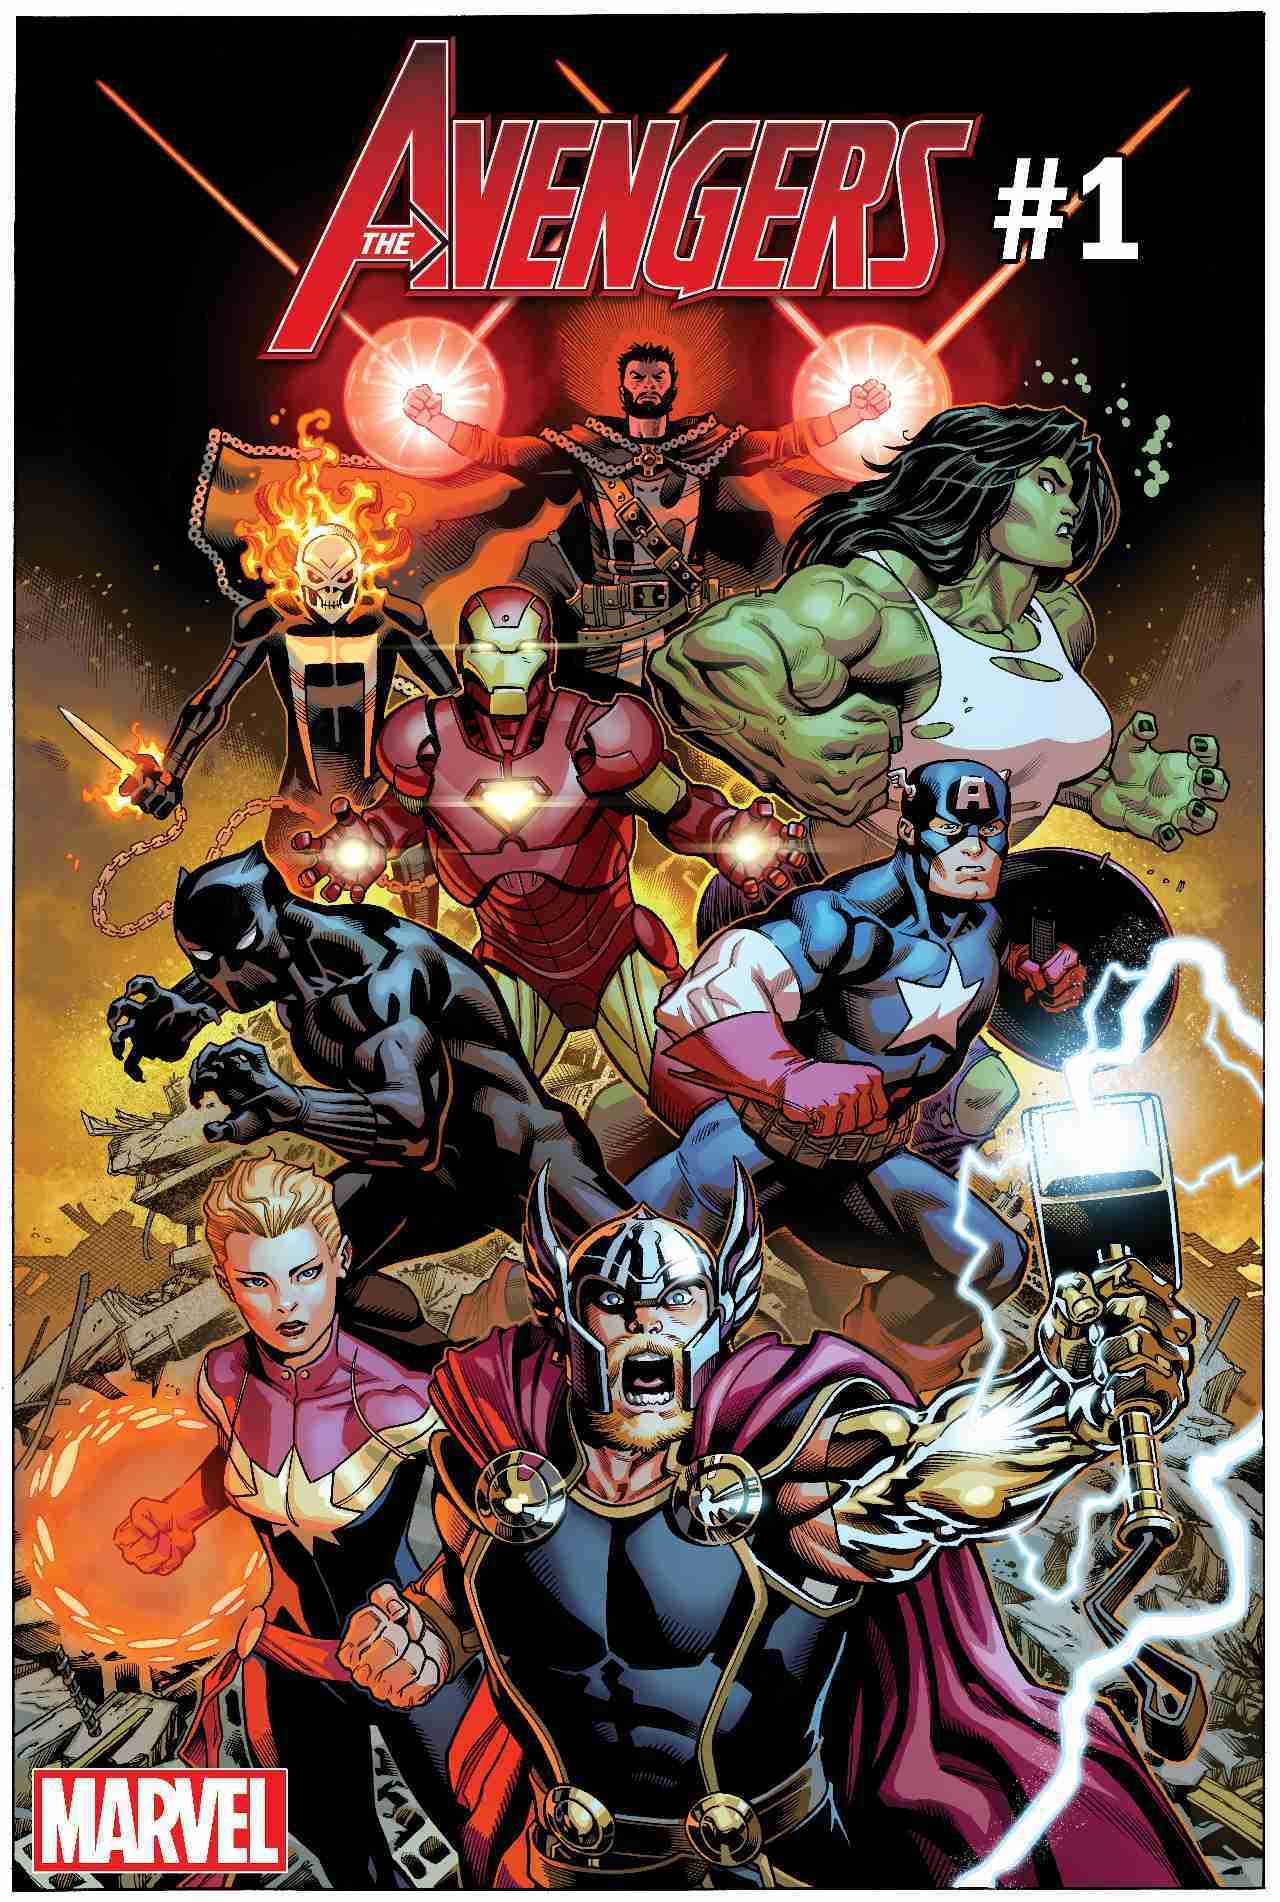 Avengers cómic